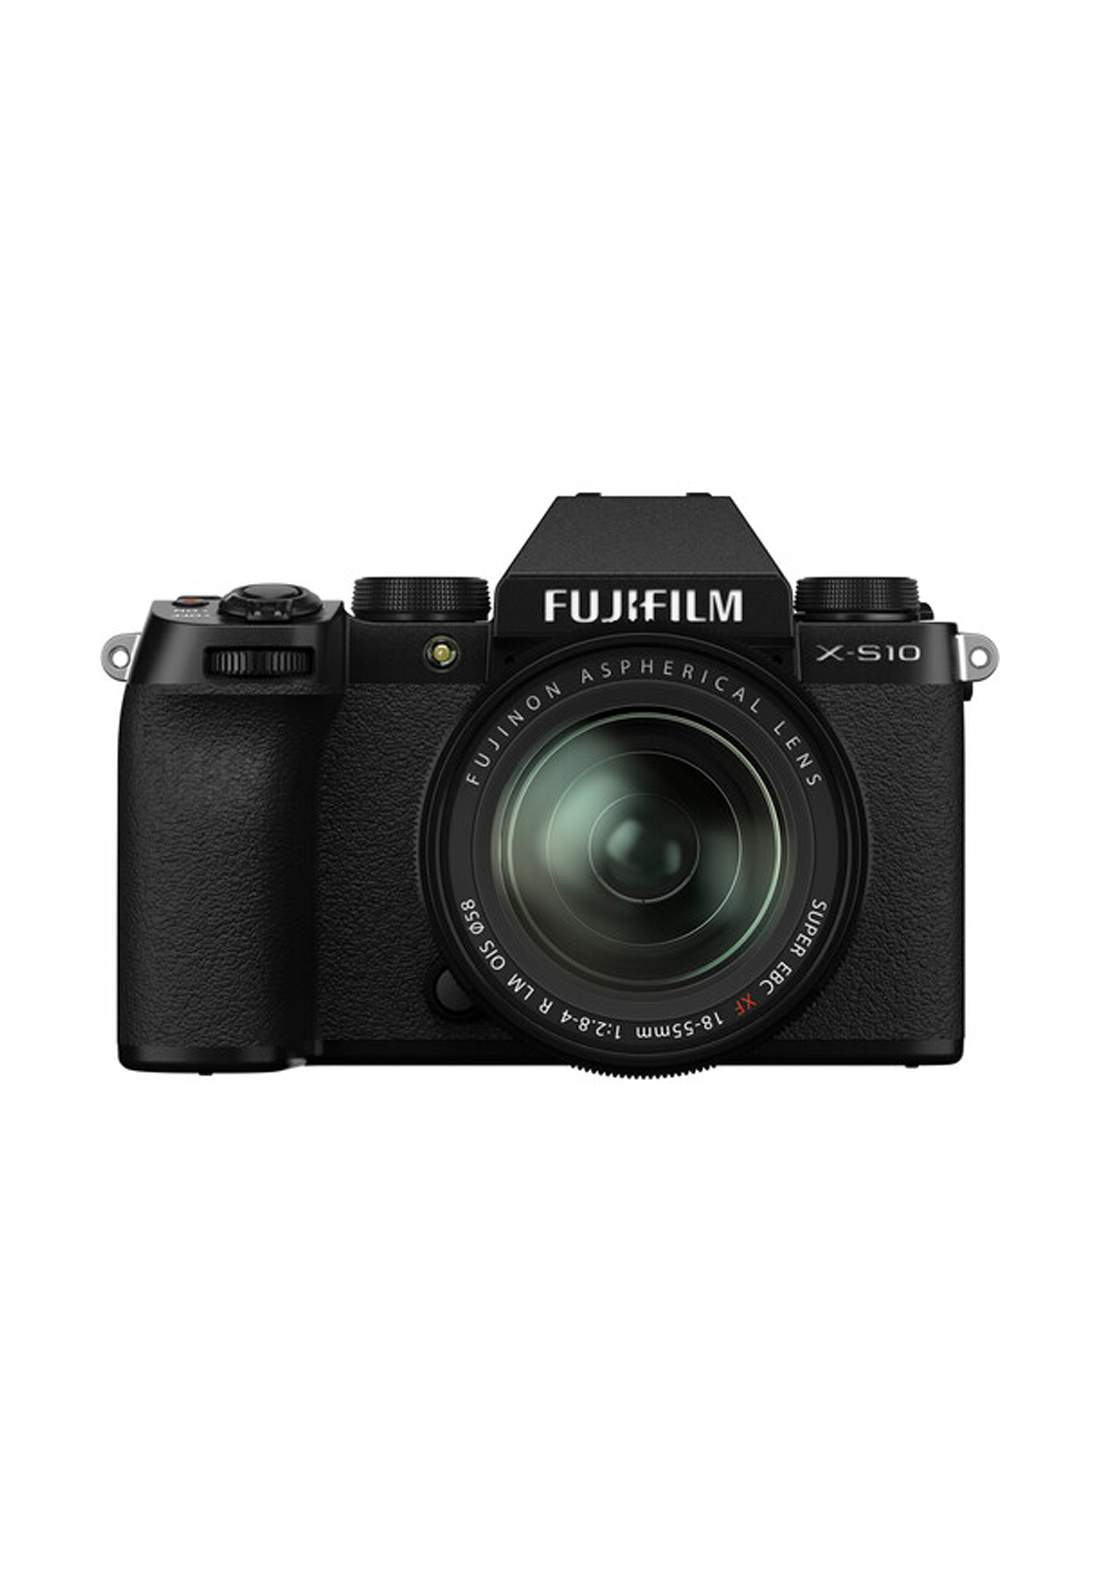 Fujifilm X-S10 Mirrorless Digital Camera with 18-55mm Lens - Black كاميرا